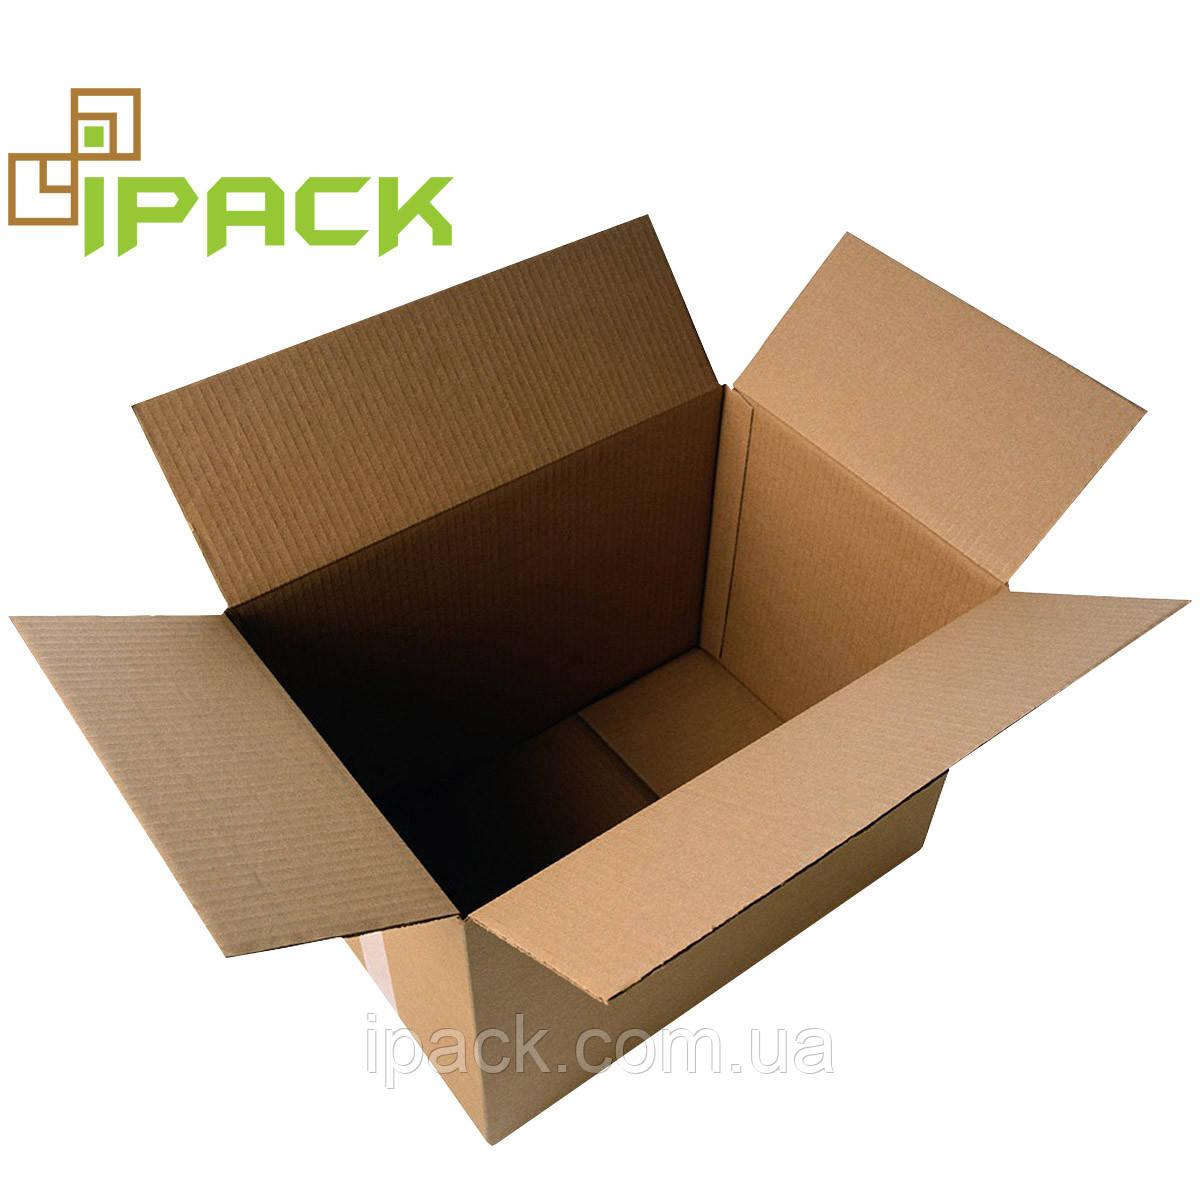 Гофроящик 100*100*200 мм бурий четырехклапанный картонний короб